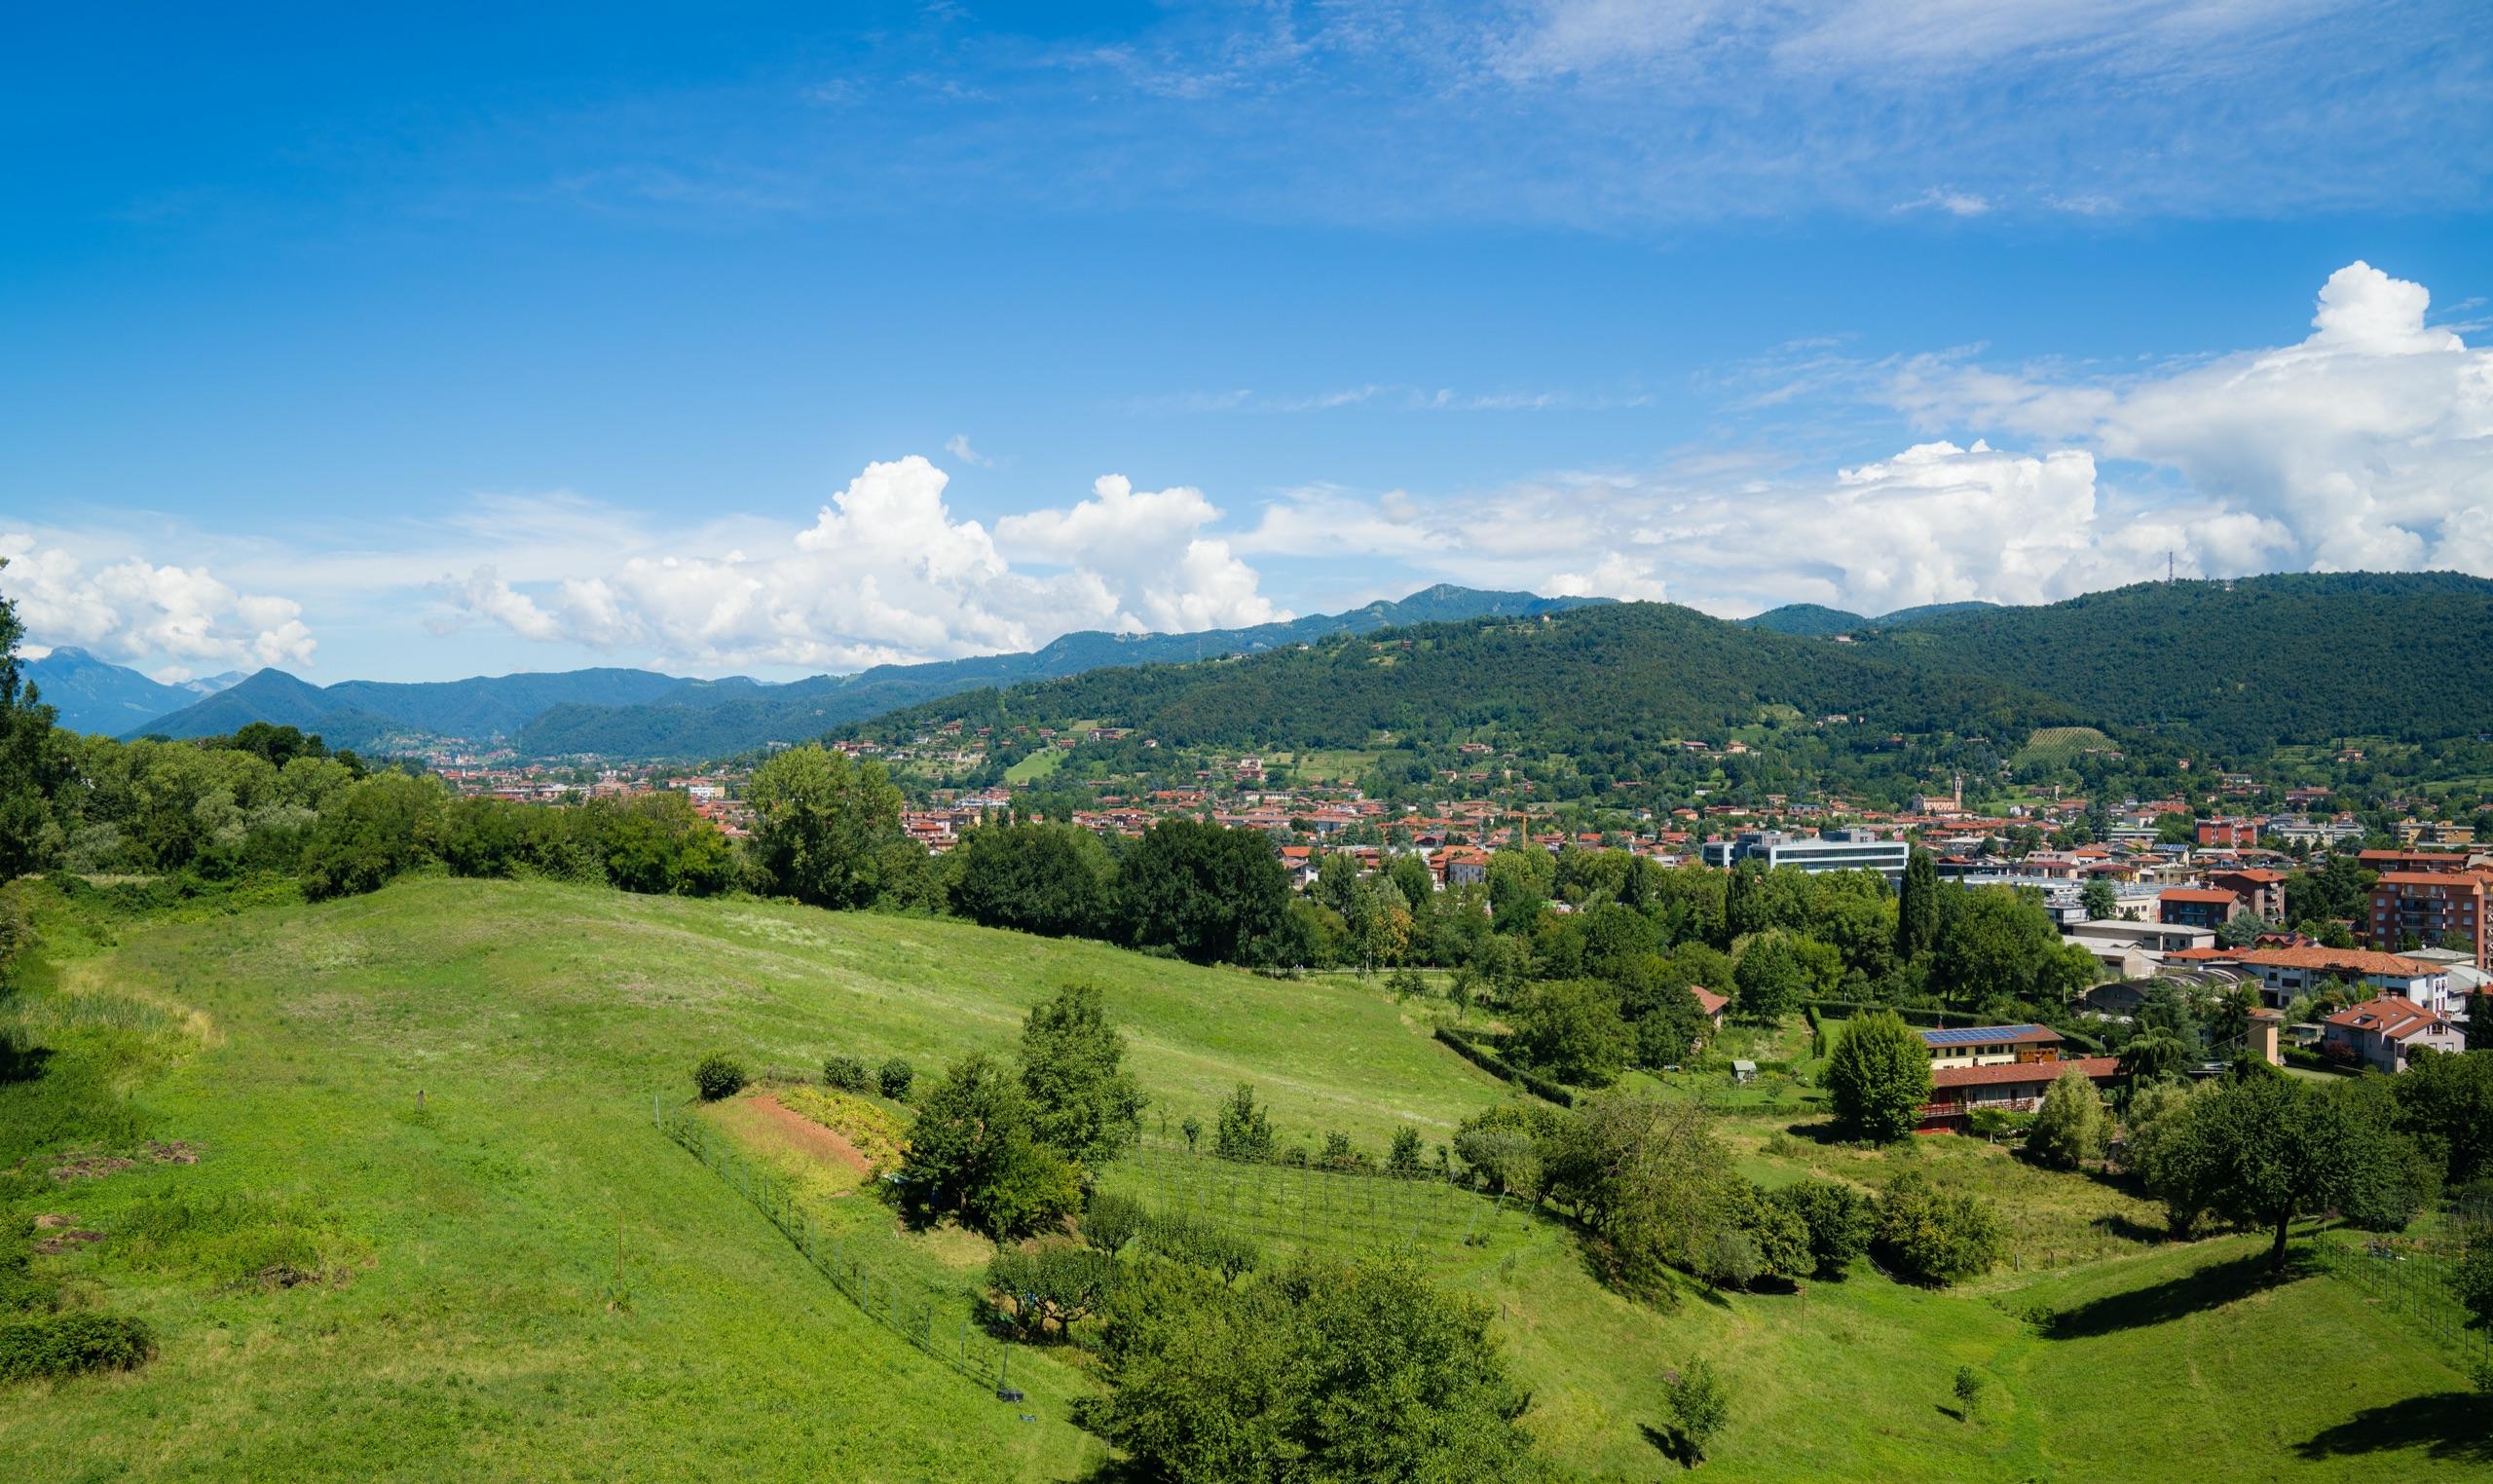 צפון איטליה. צילום: Pixabay